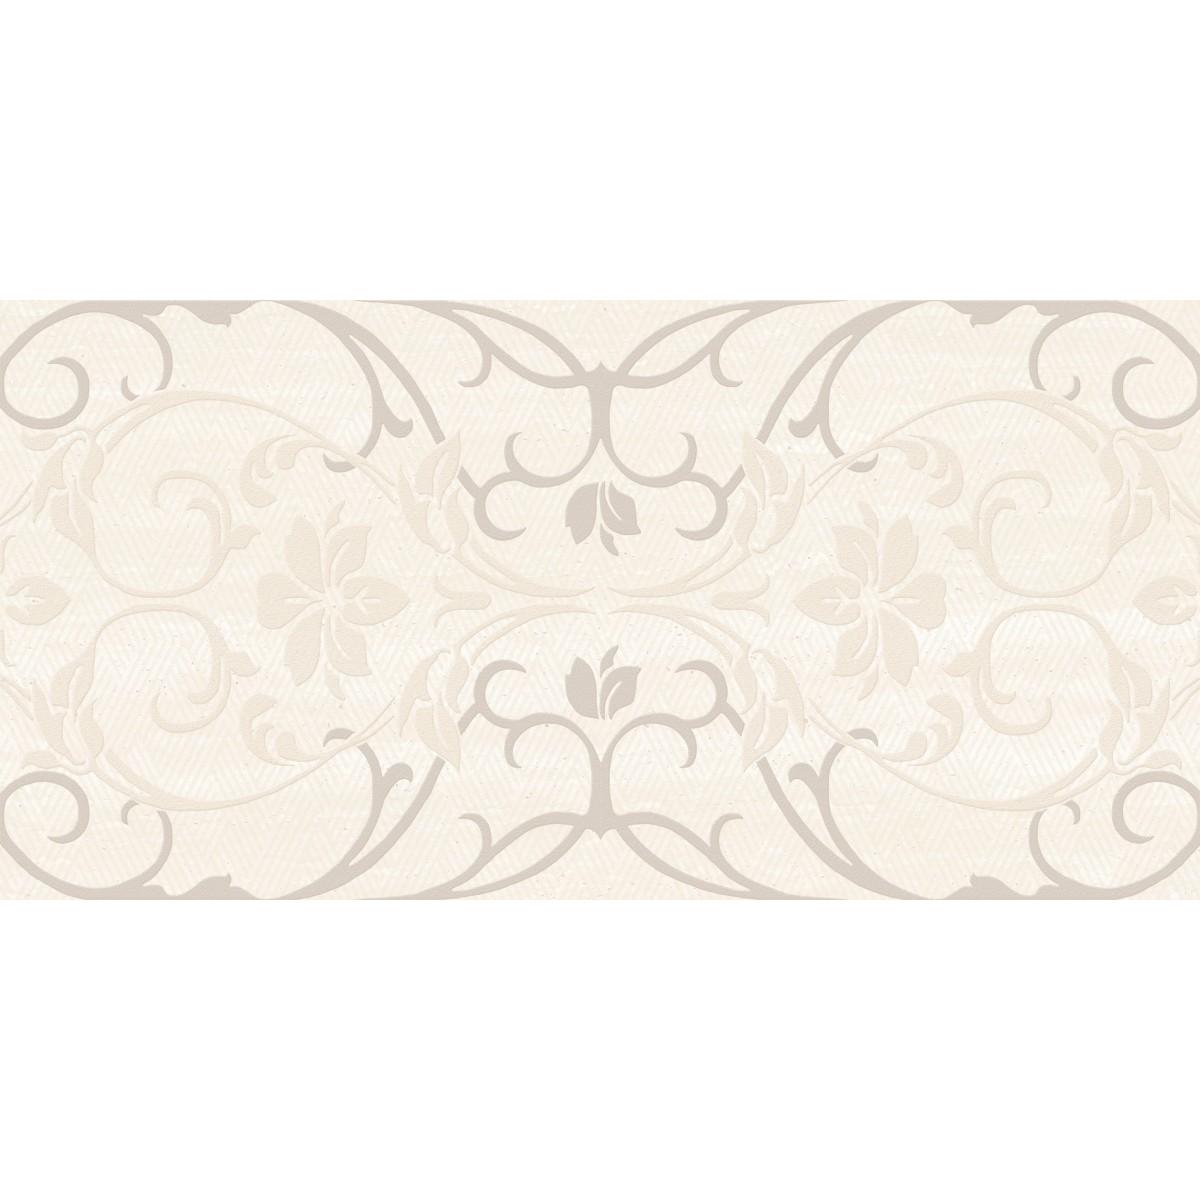 Декор «Кастельон» 30х60 см цвет бежевый